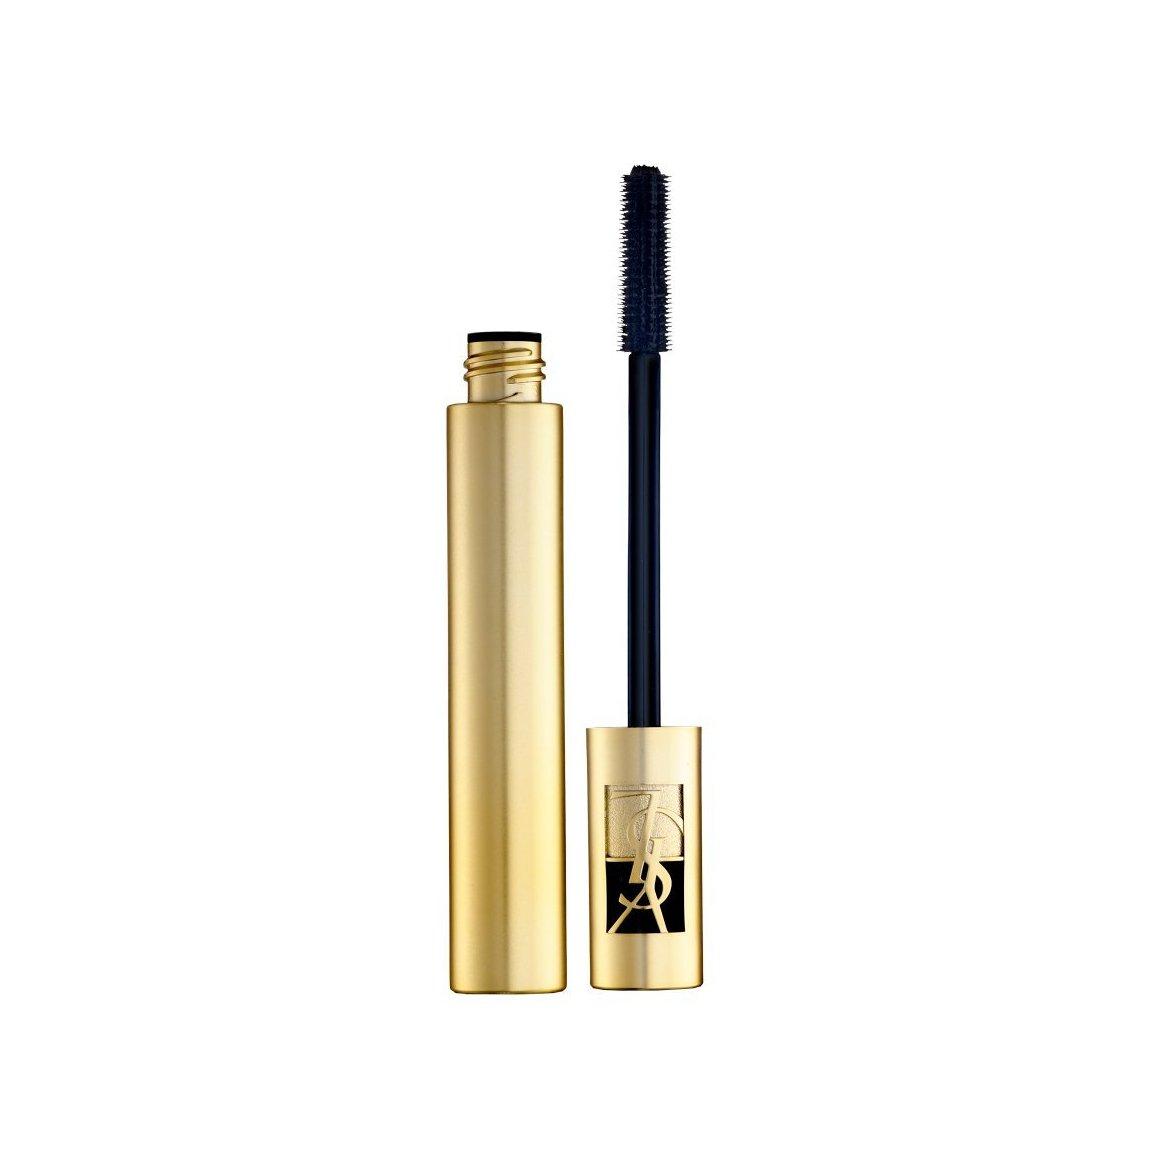 Resultado de imagem para Yves Saint Laurent Everlong Mascara Waterproof